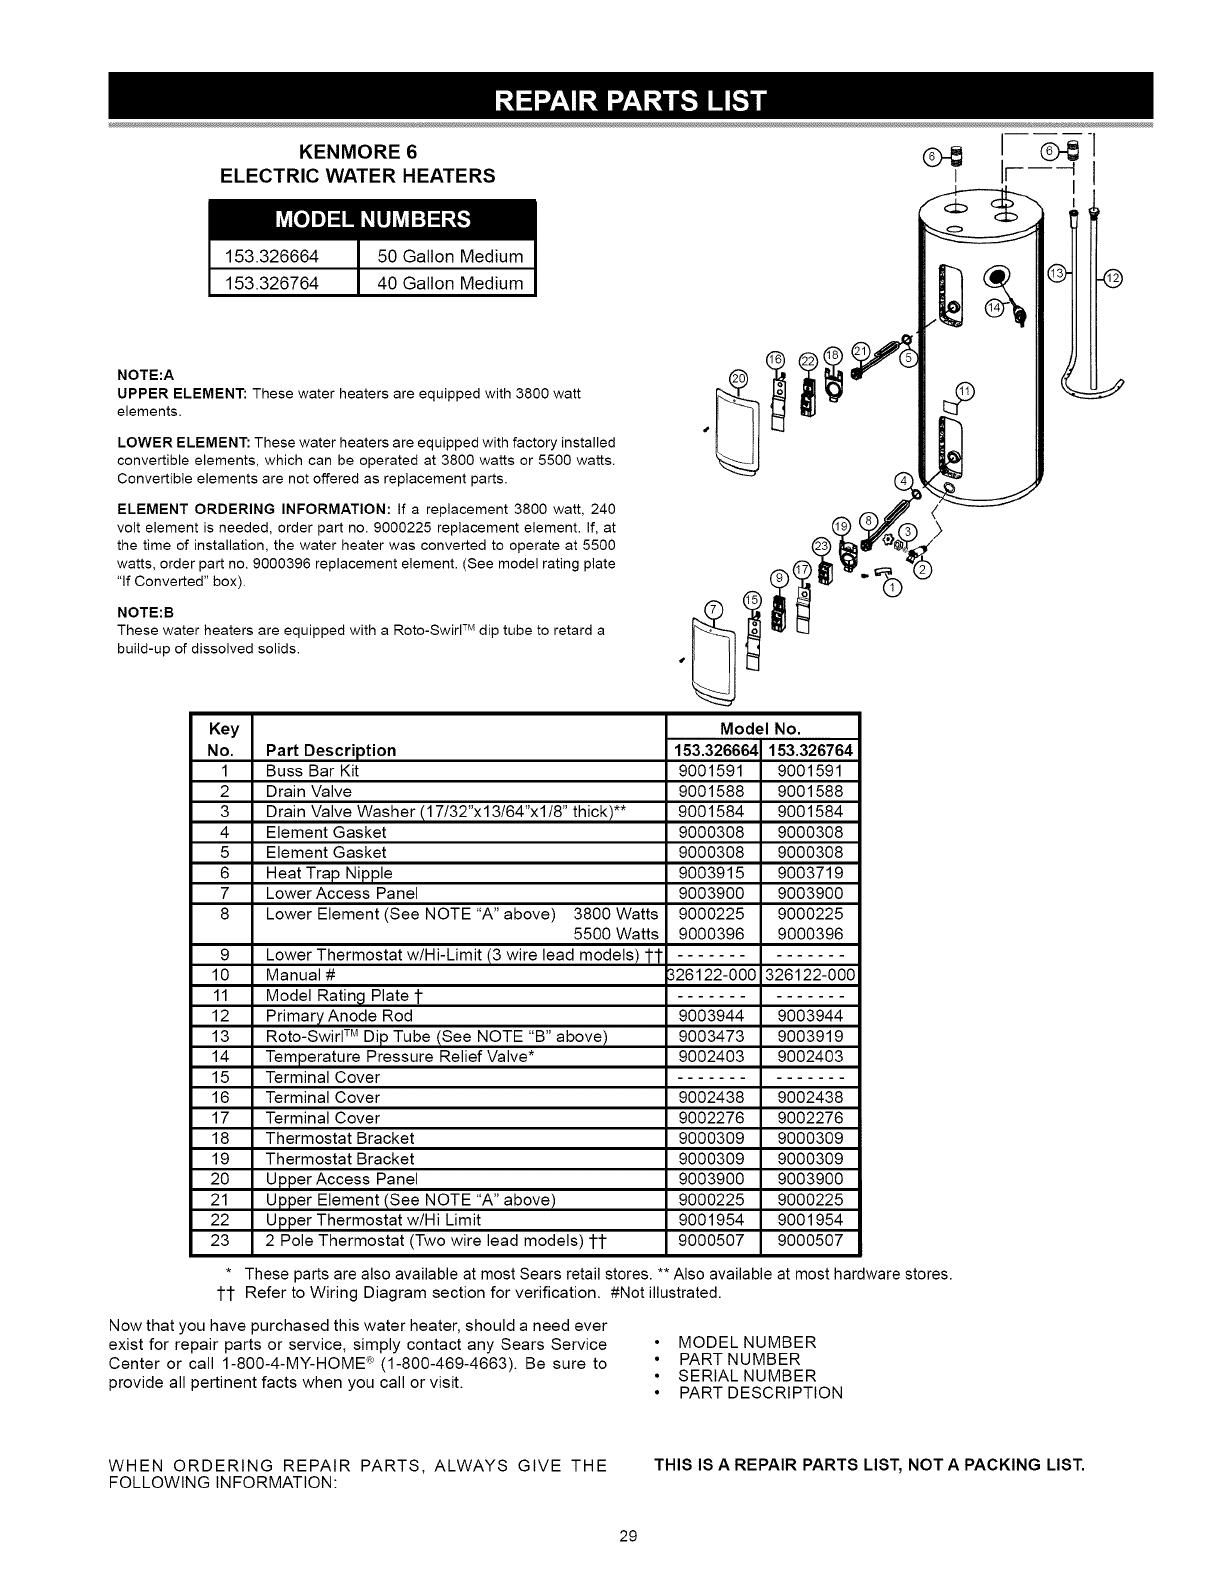 Kenmore User Manual Water Heater Manuals And